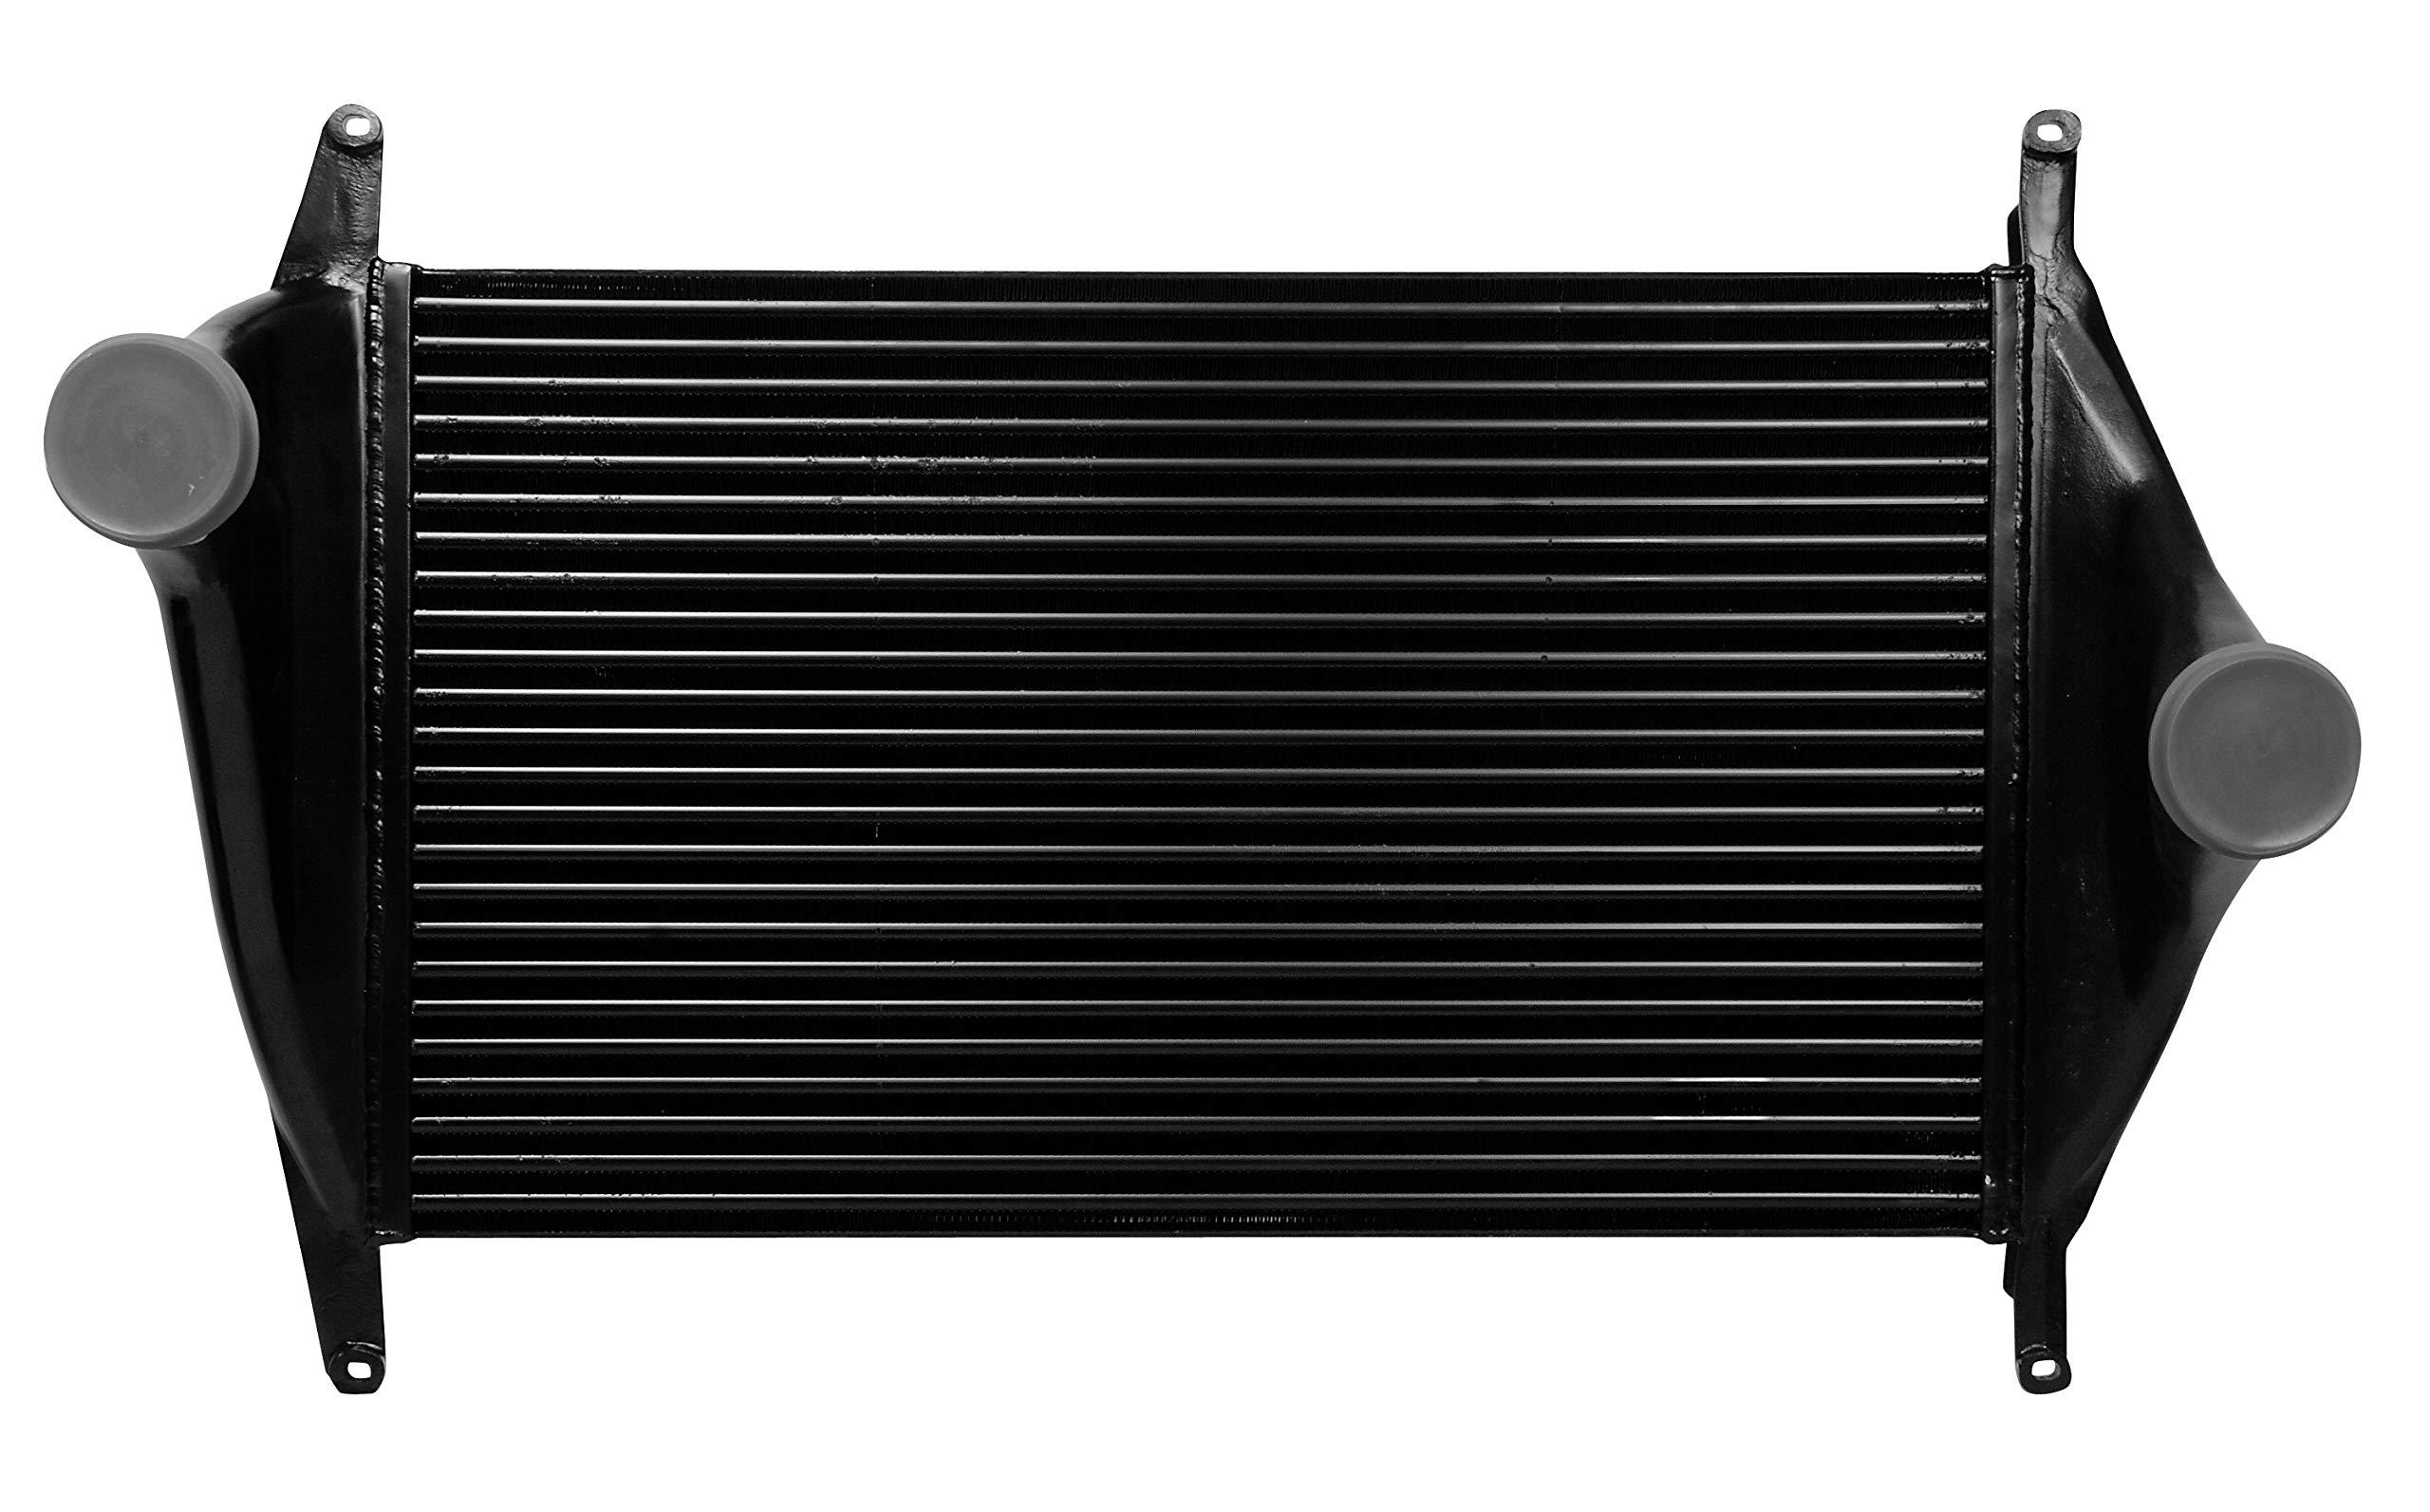 Spectra Premium 4401-1706 Turbocharger Intercooler